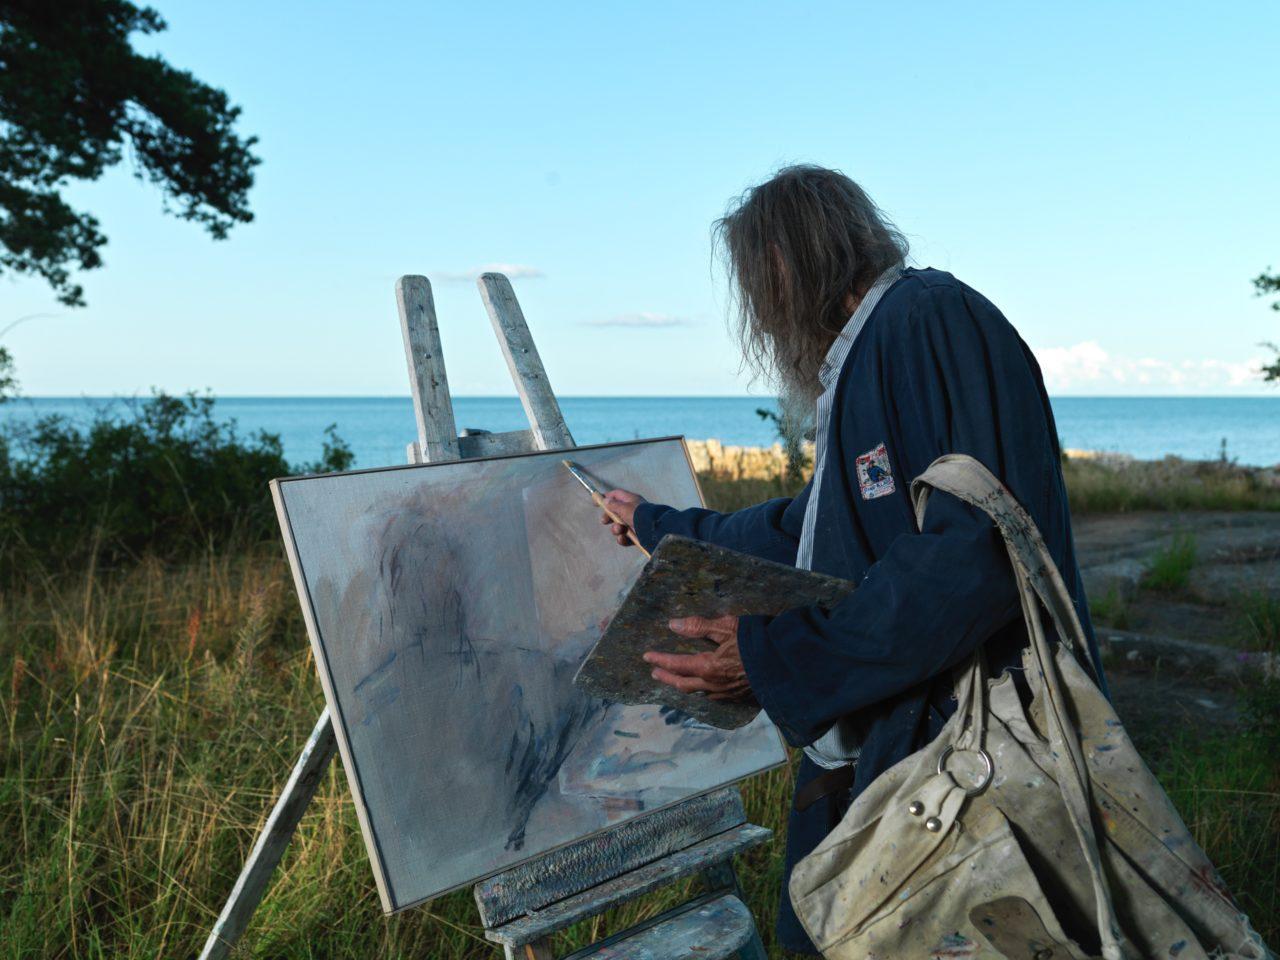 Österlen art will be created before the September exhibition